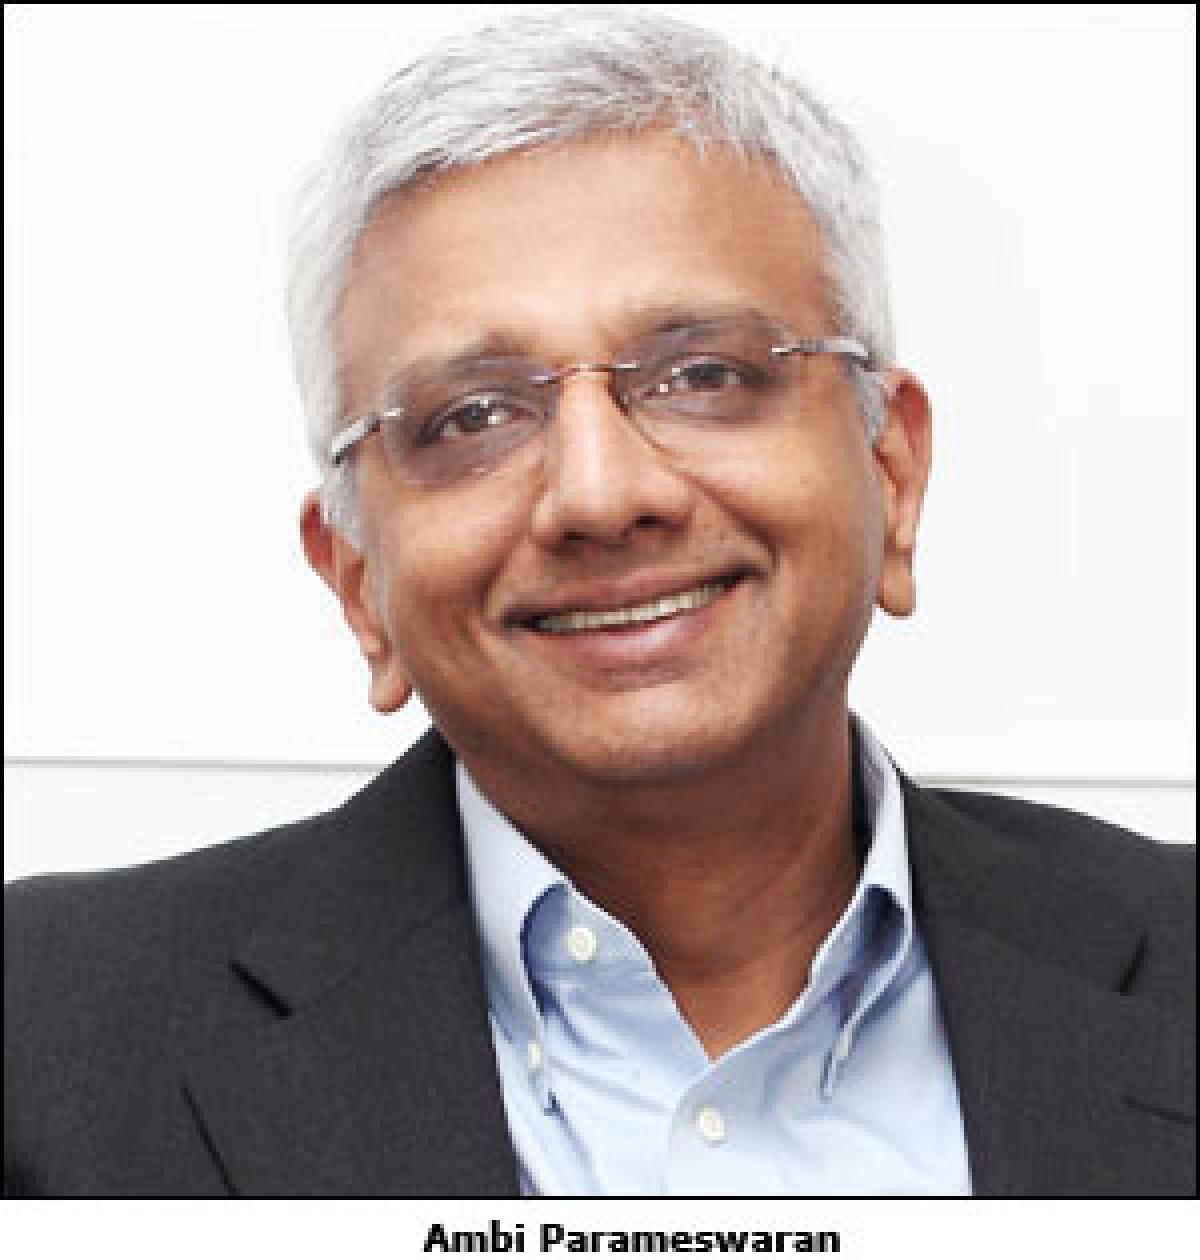 """Kulzy will bring transparency into the ad industry"": Ambi Parameswaran, investor, Kulzy.com"